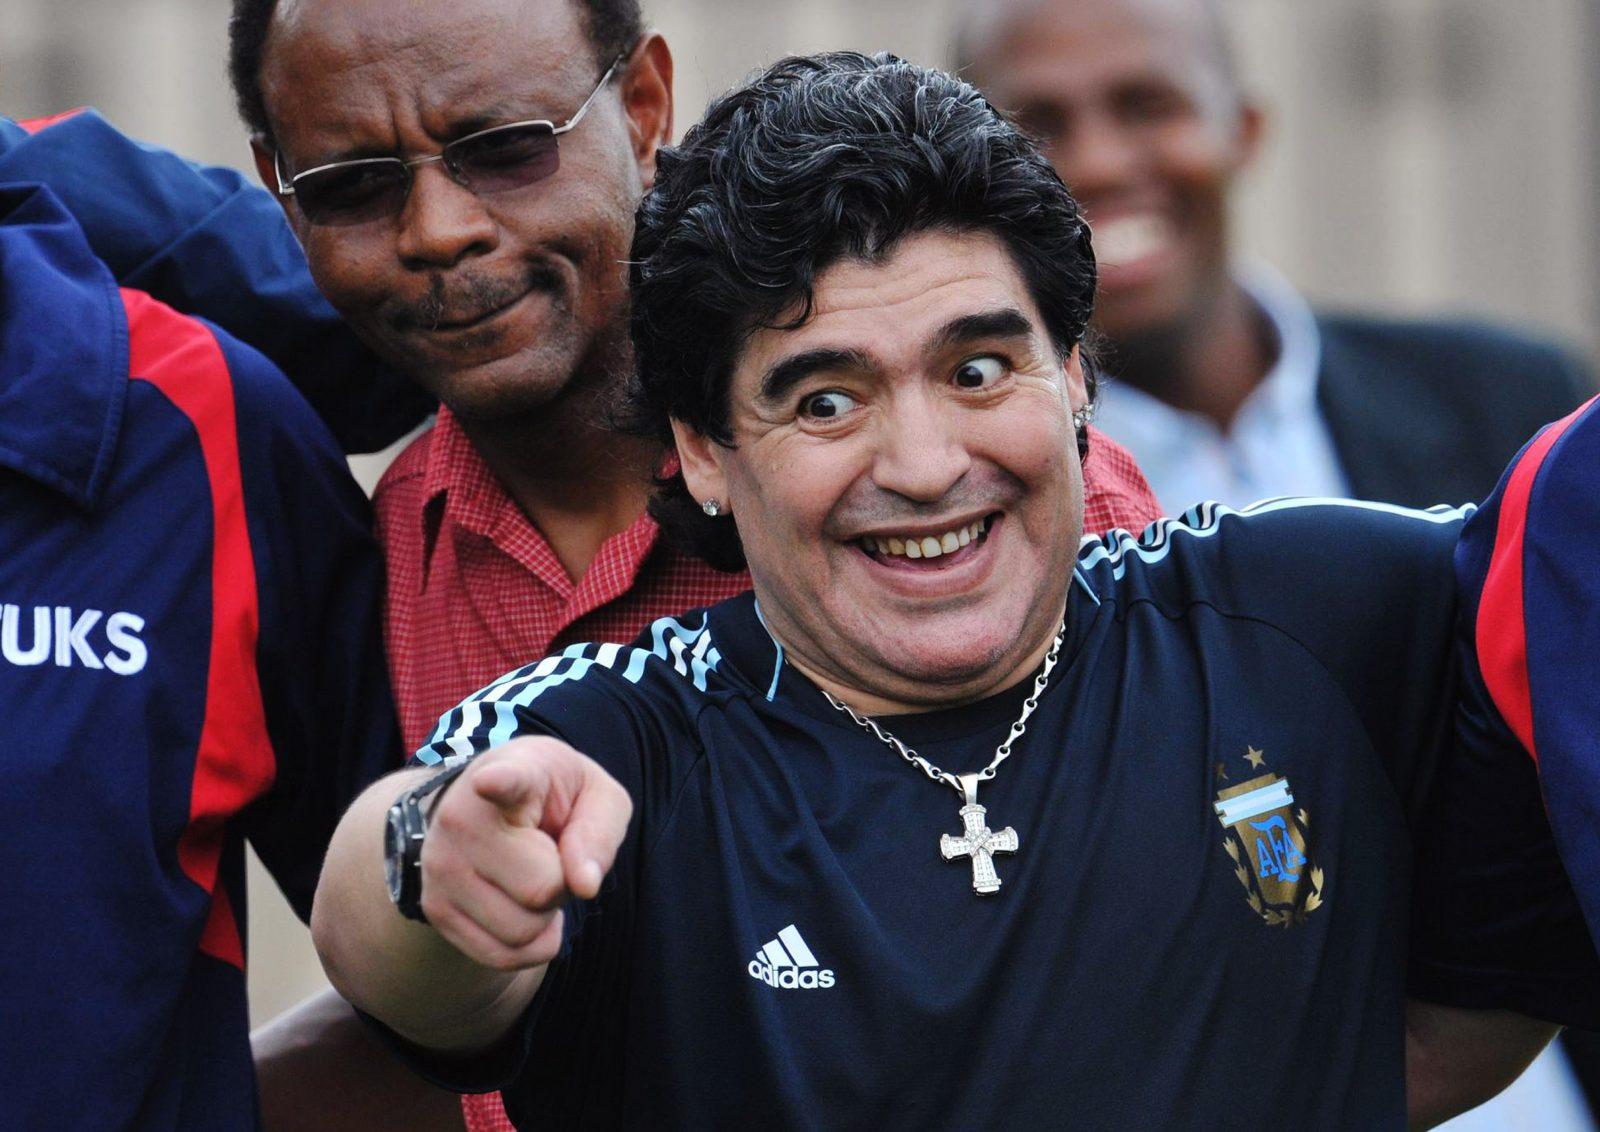 Diego Maradona: Maverick spirit lives on in today's athlete activists